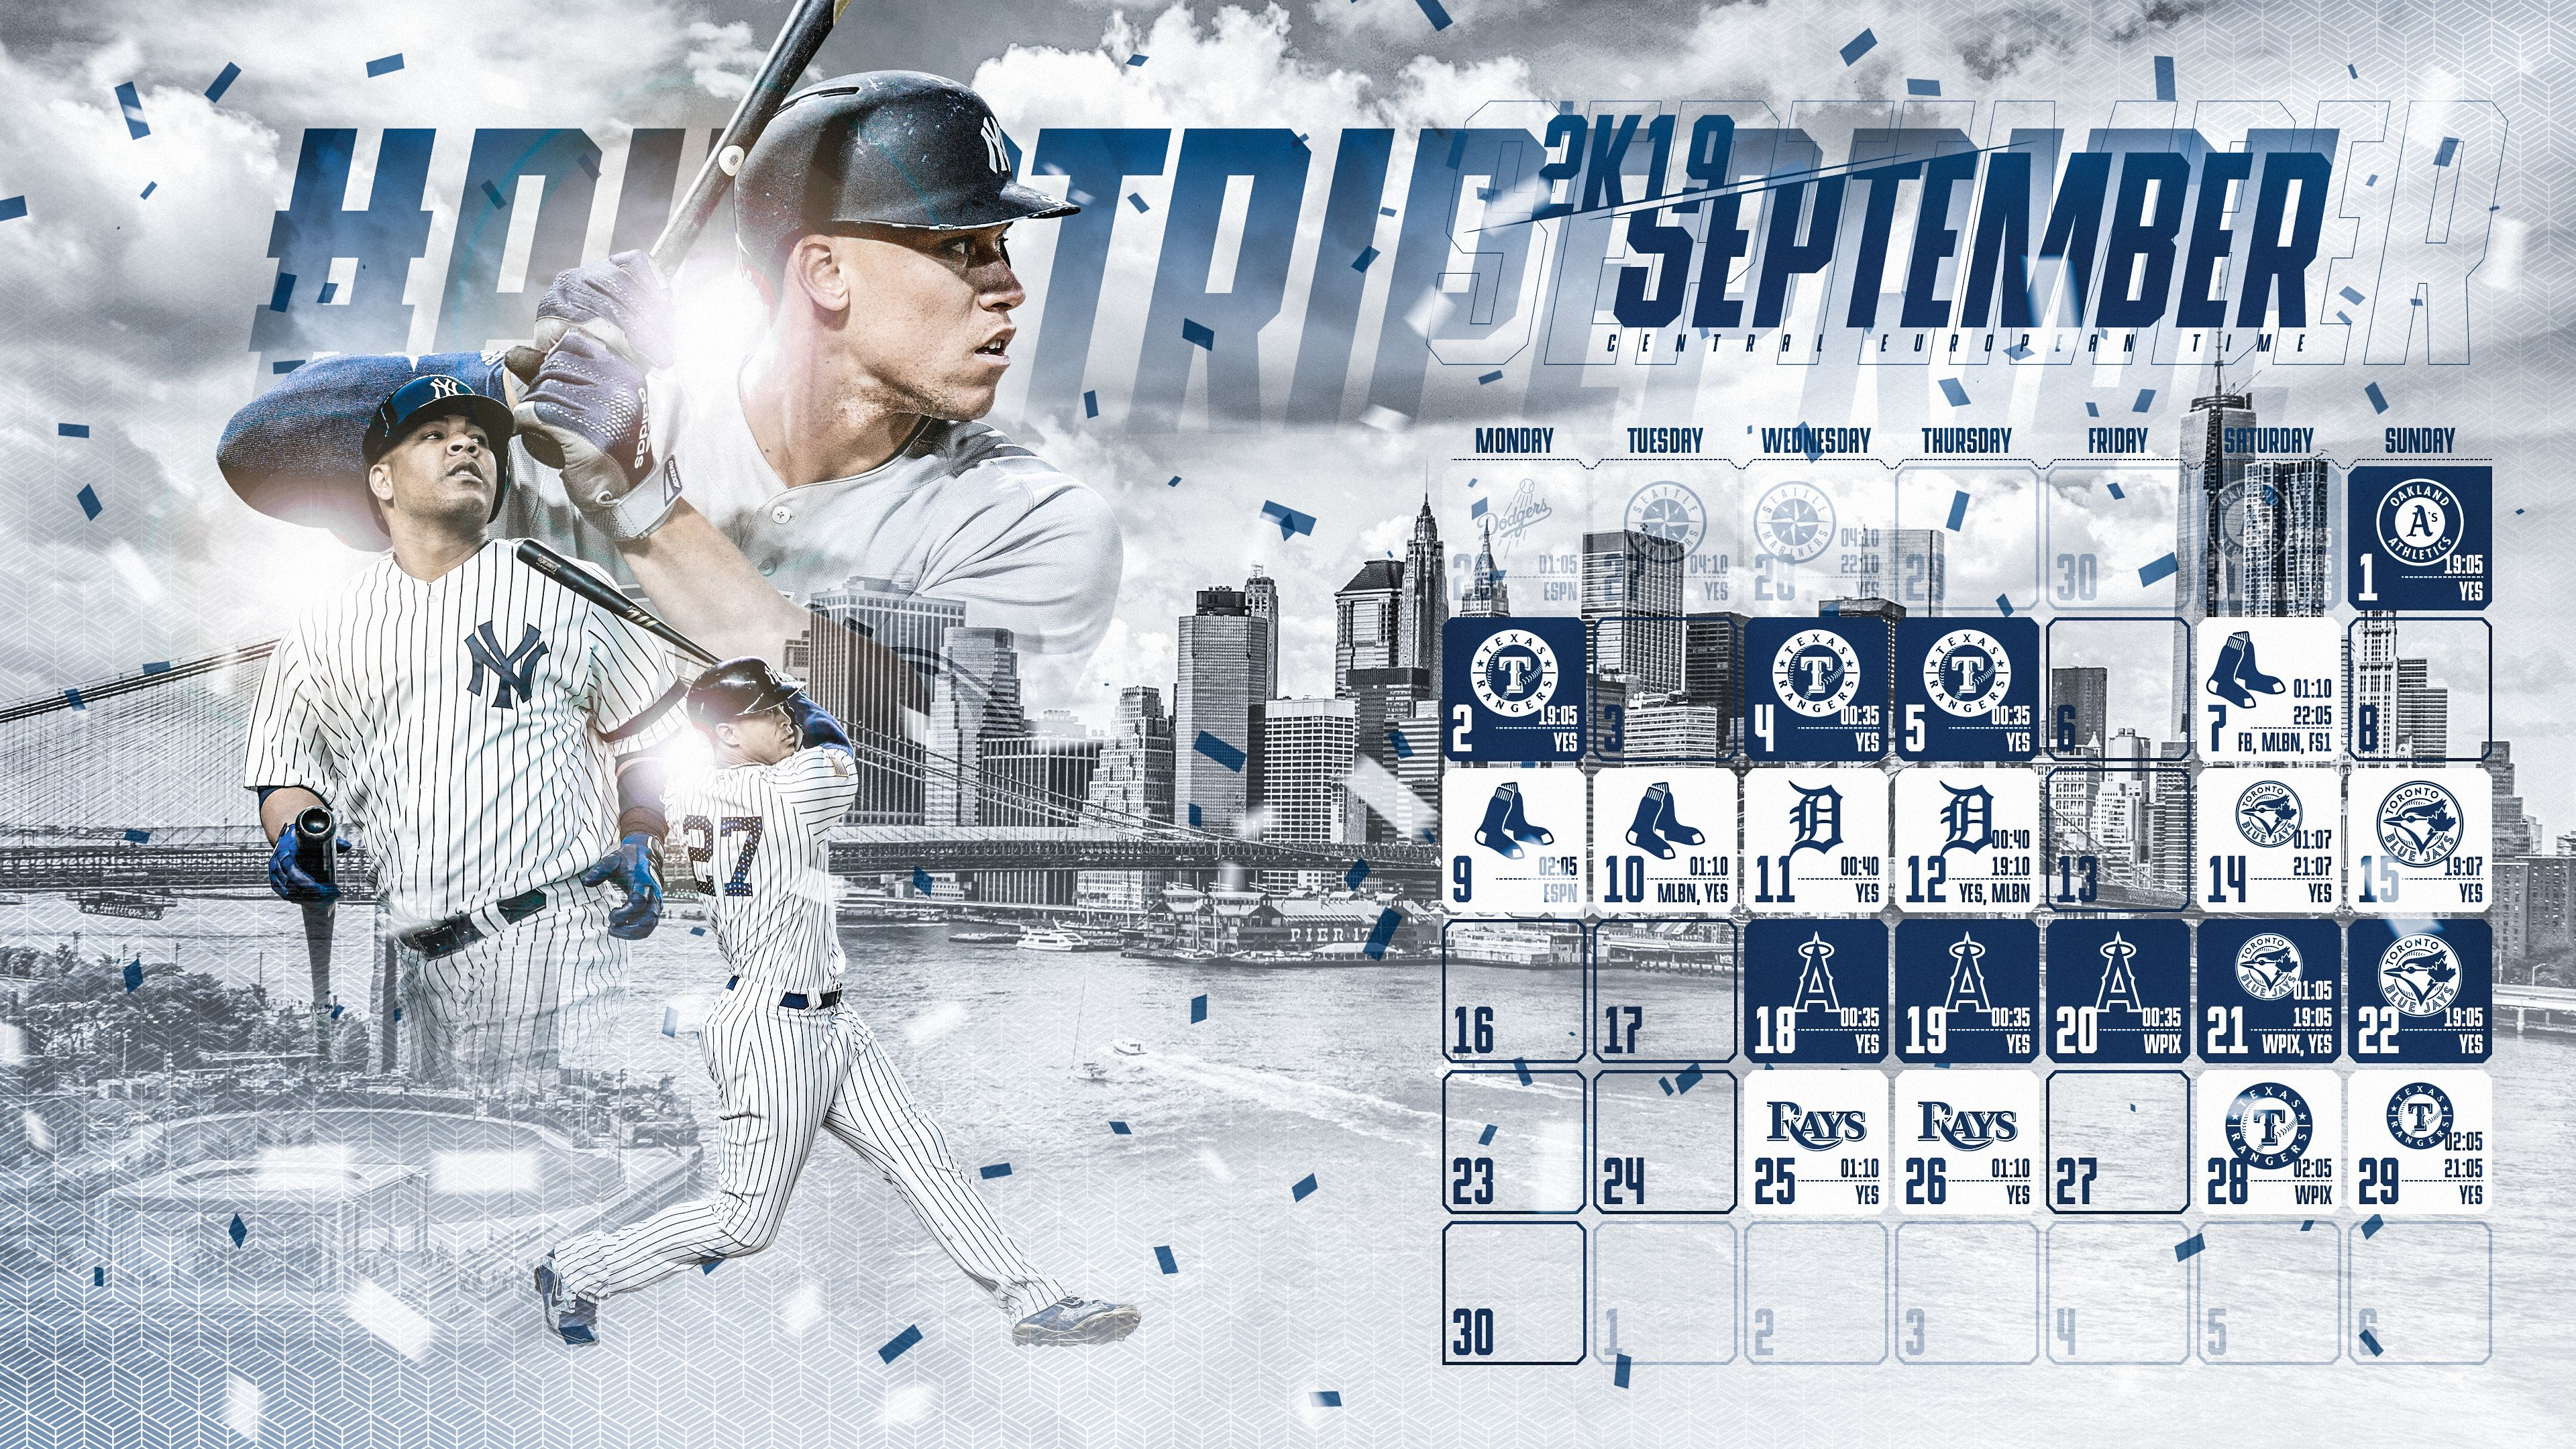 Schedule Wallpaper for the New York Yankees Regular Season